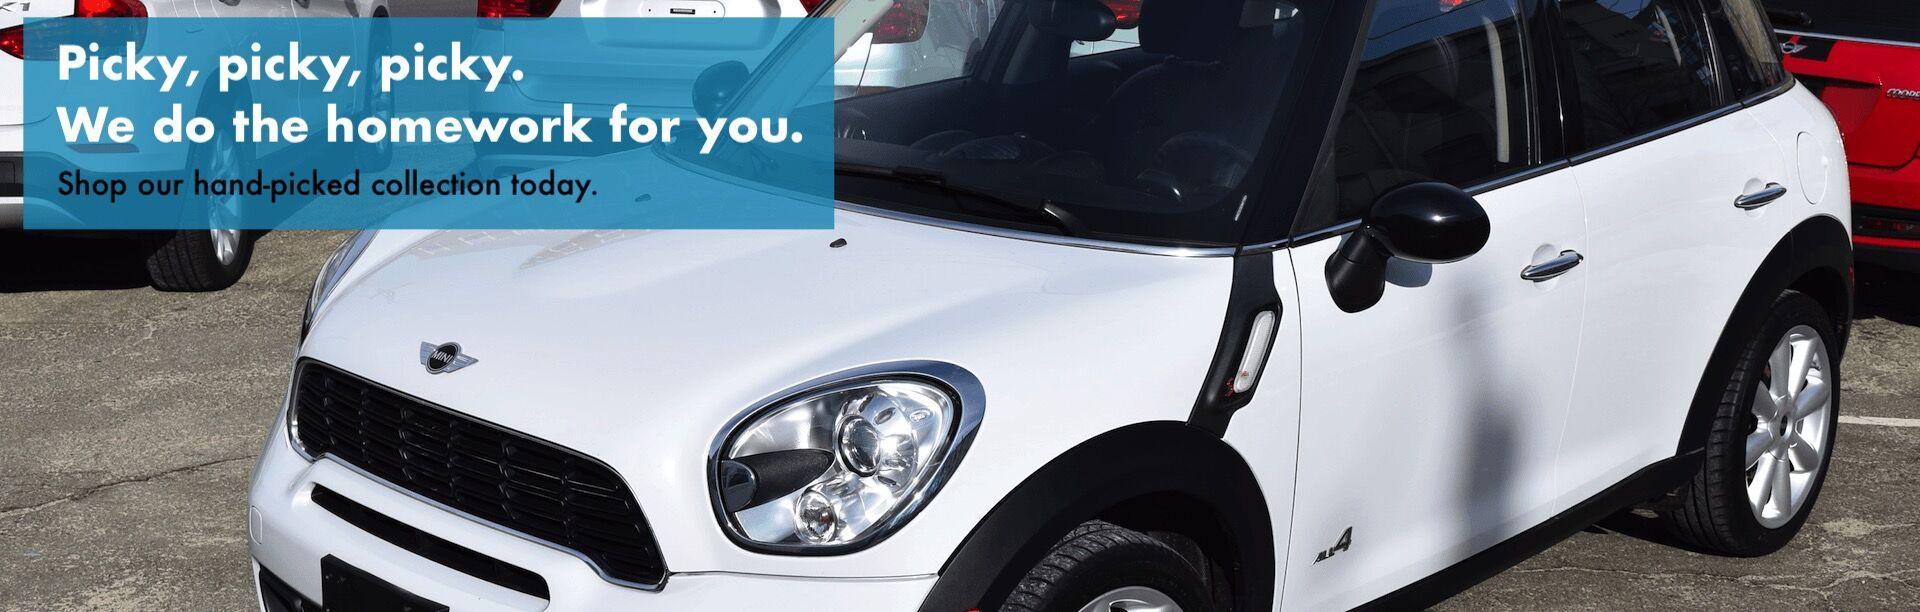 European Auto Repair, Service, Used Vehicle Dealership New